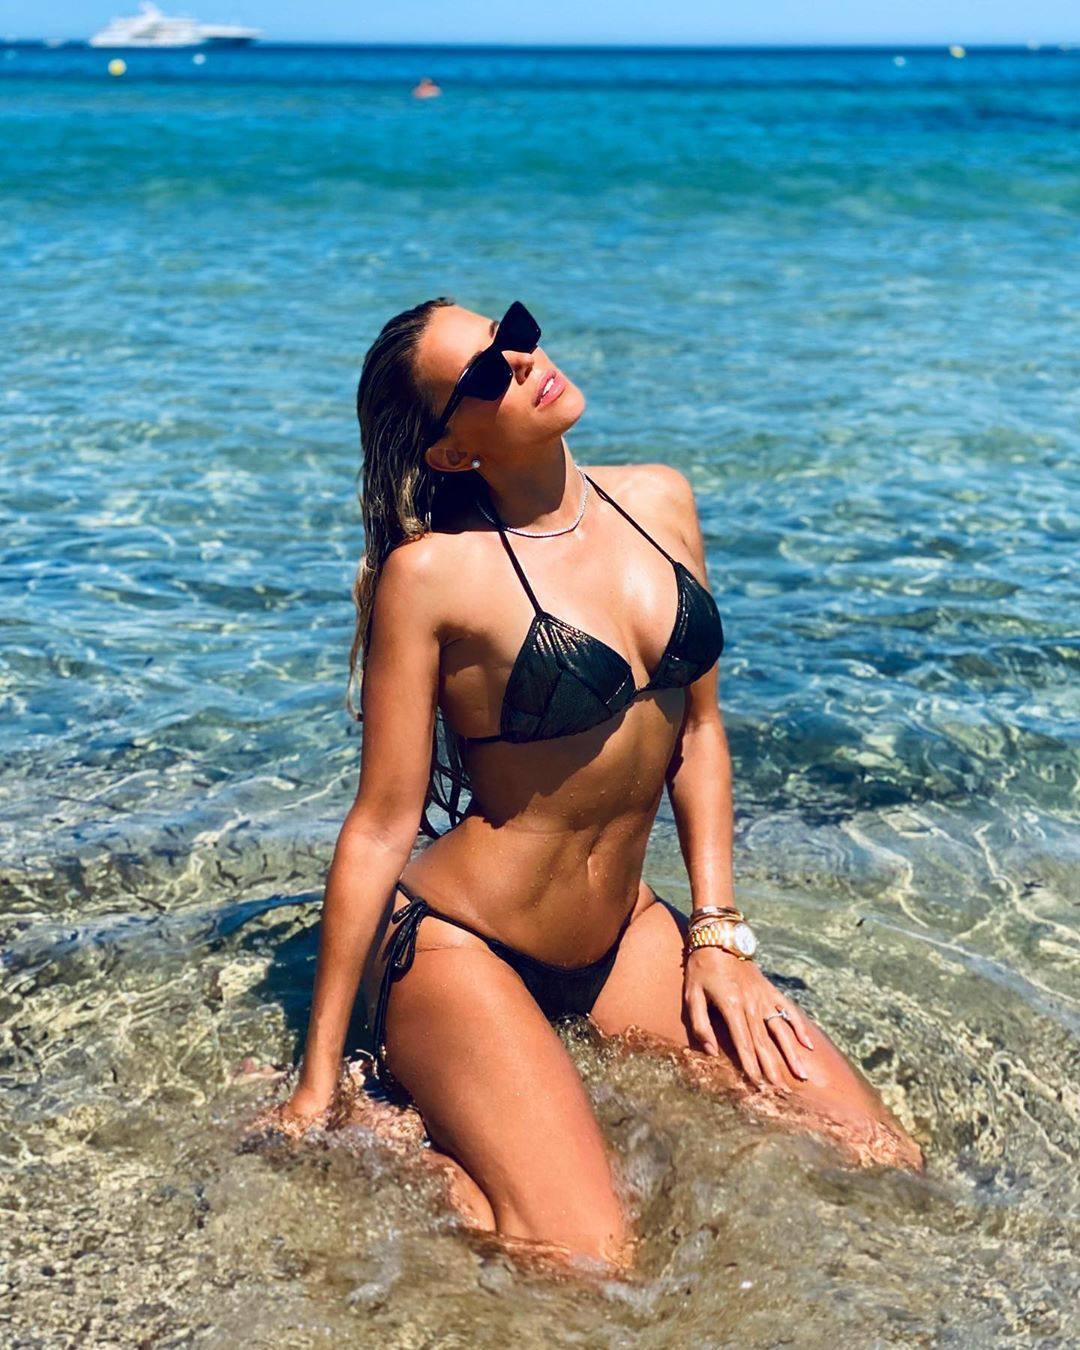 Sylvie Meis – Sexy Boobs In Bikini On The Beach In Saint Tropez 0024